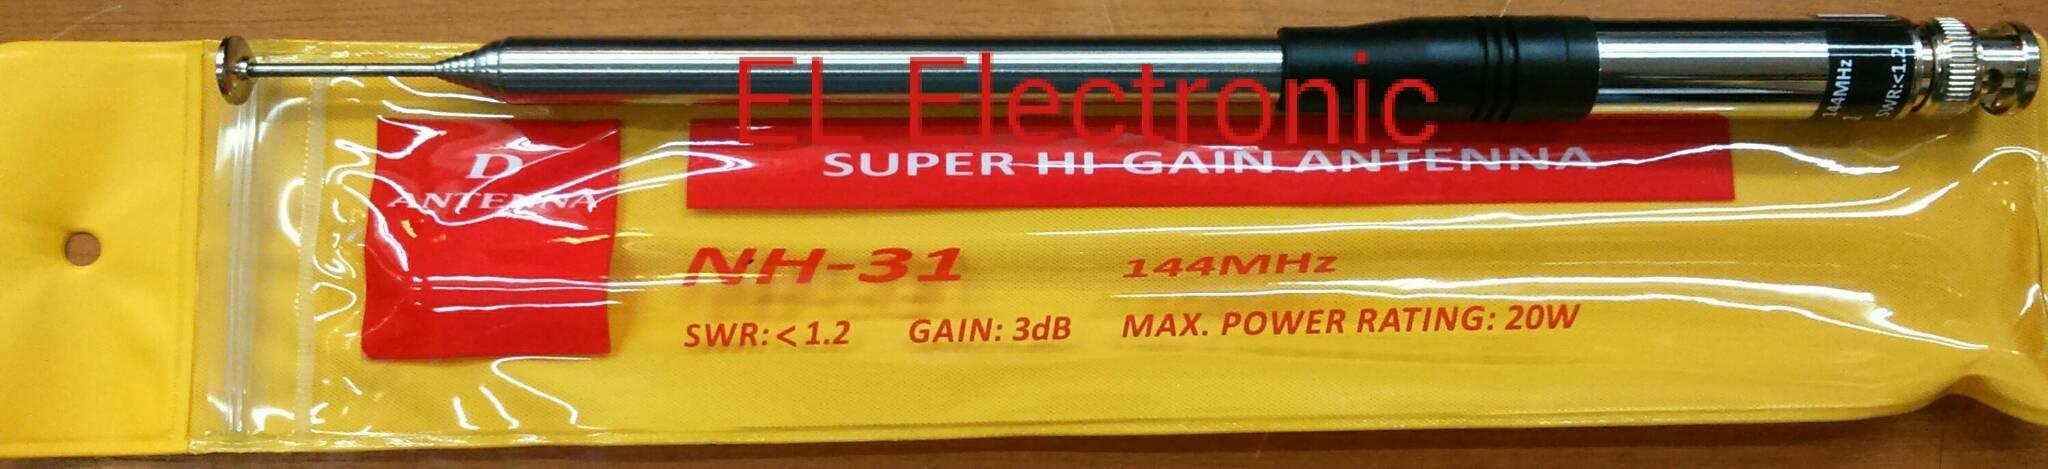 Antena Tarik Super Stick BNC Alinco Icom NH-31 / model ARH-770 Murah